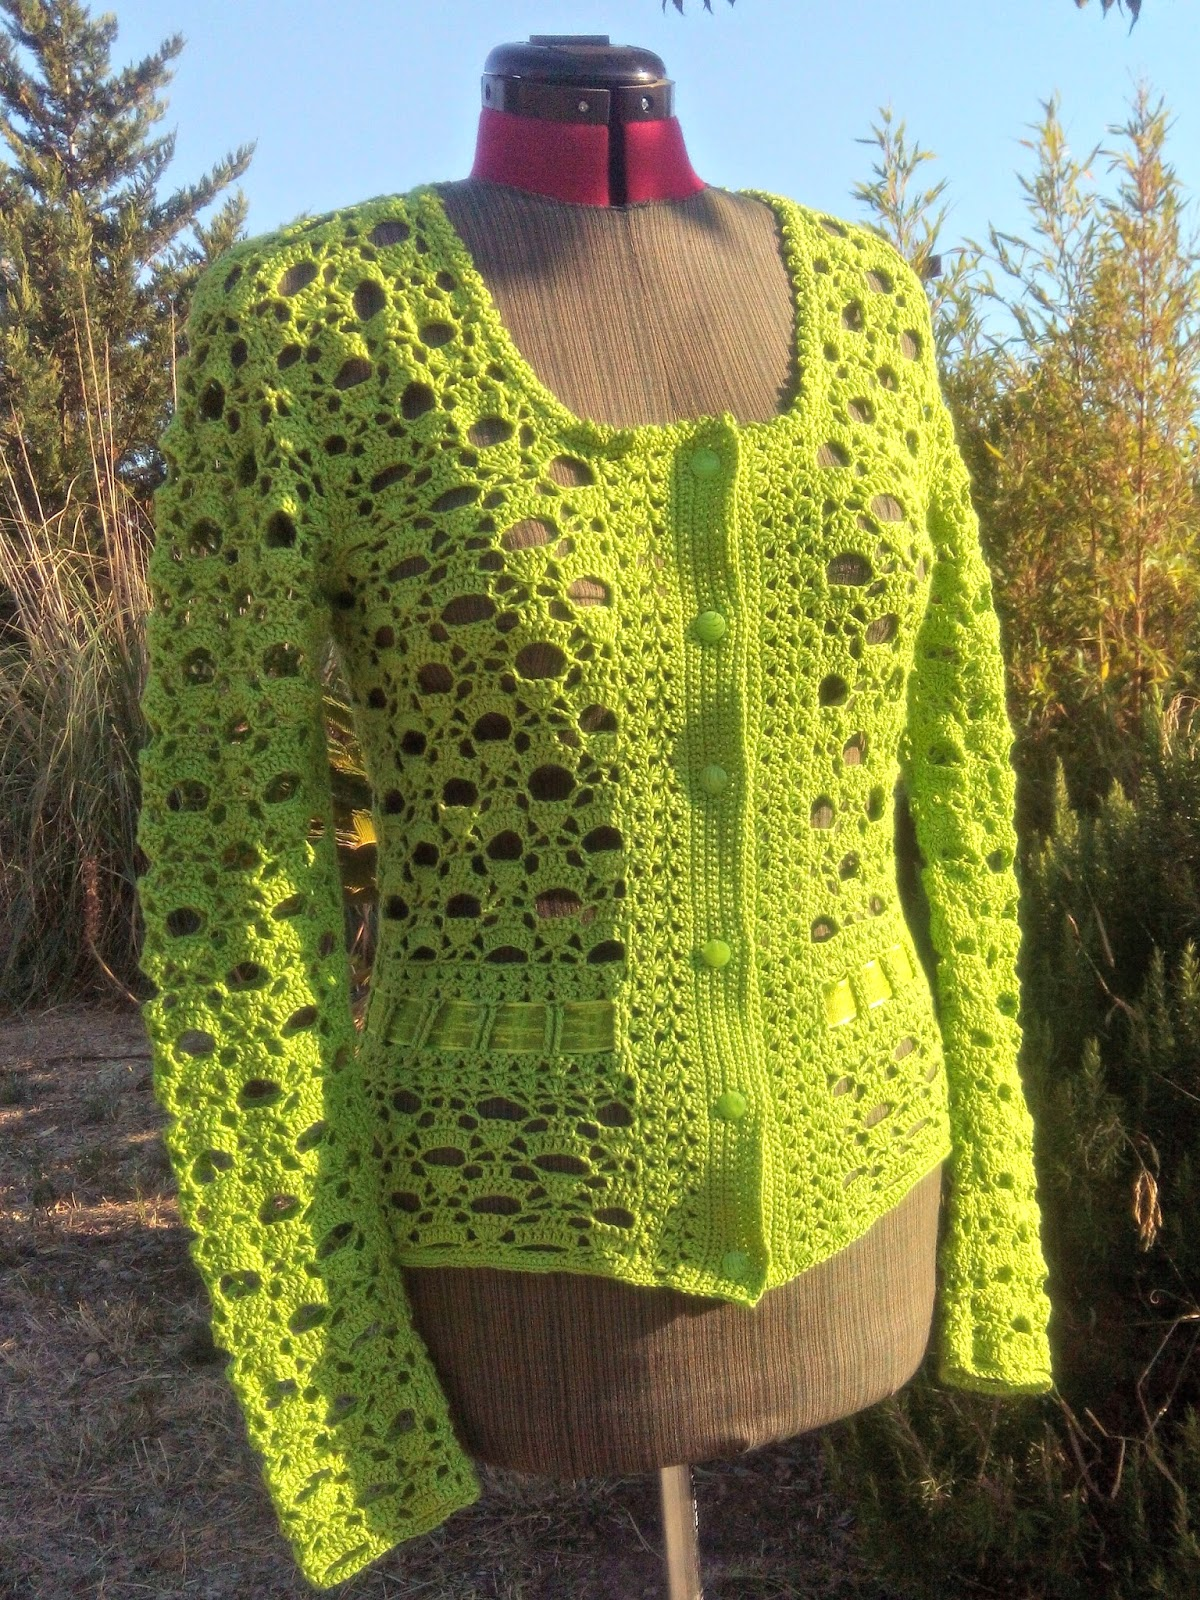 Cosir coser sewing chaqueta de crochet - Dibujos de ganchillo ...